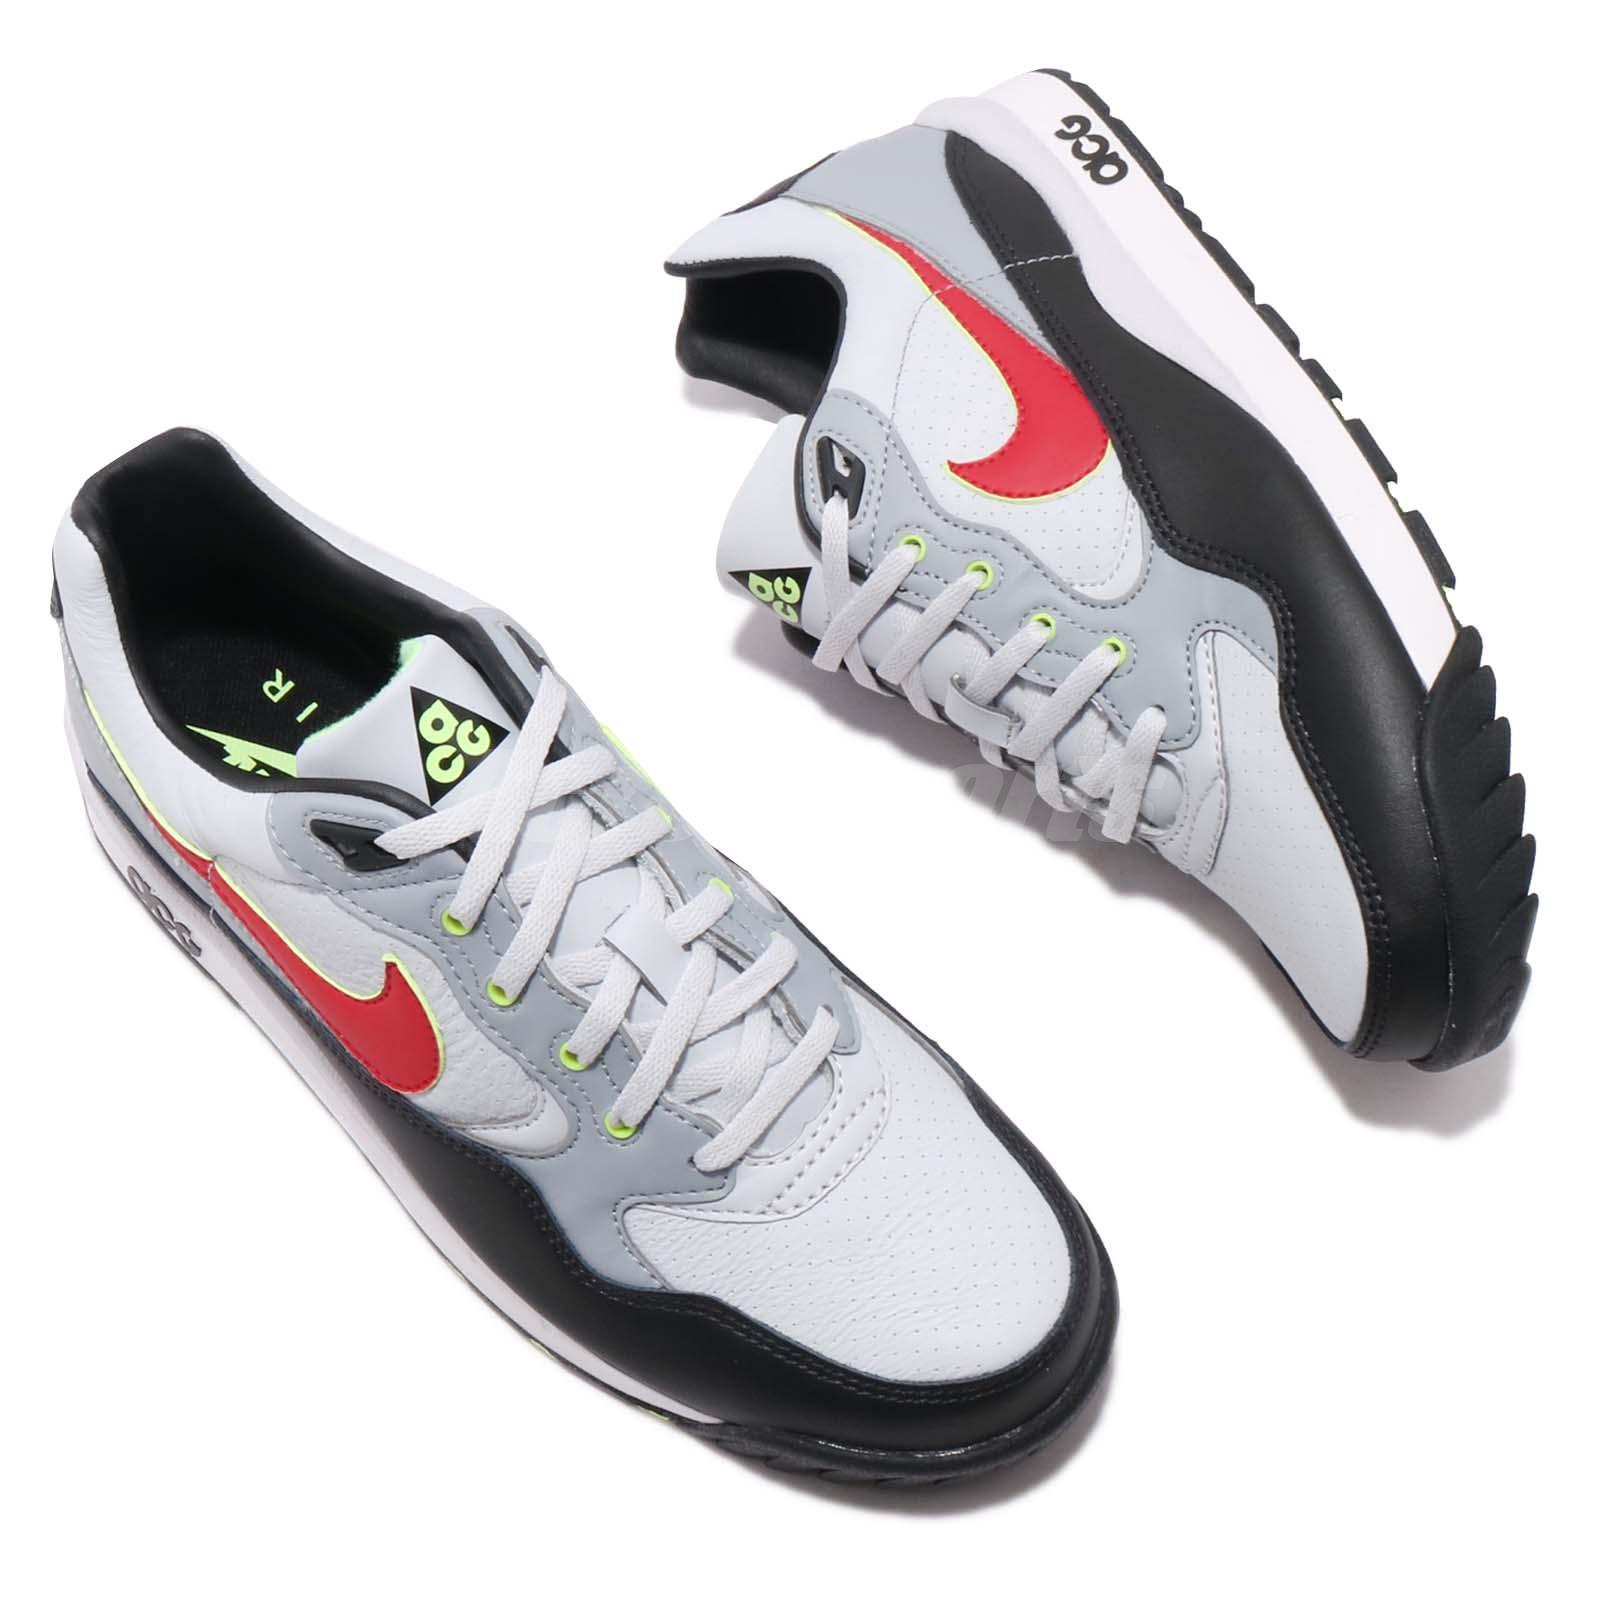 Nike Air Wildwood ACG Grey Red Black Men Outdoors Shoes Sneakers ... 16515865a